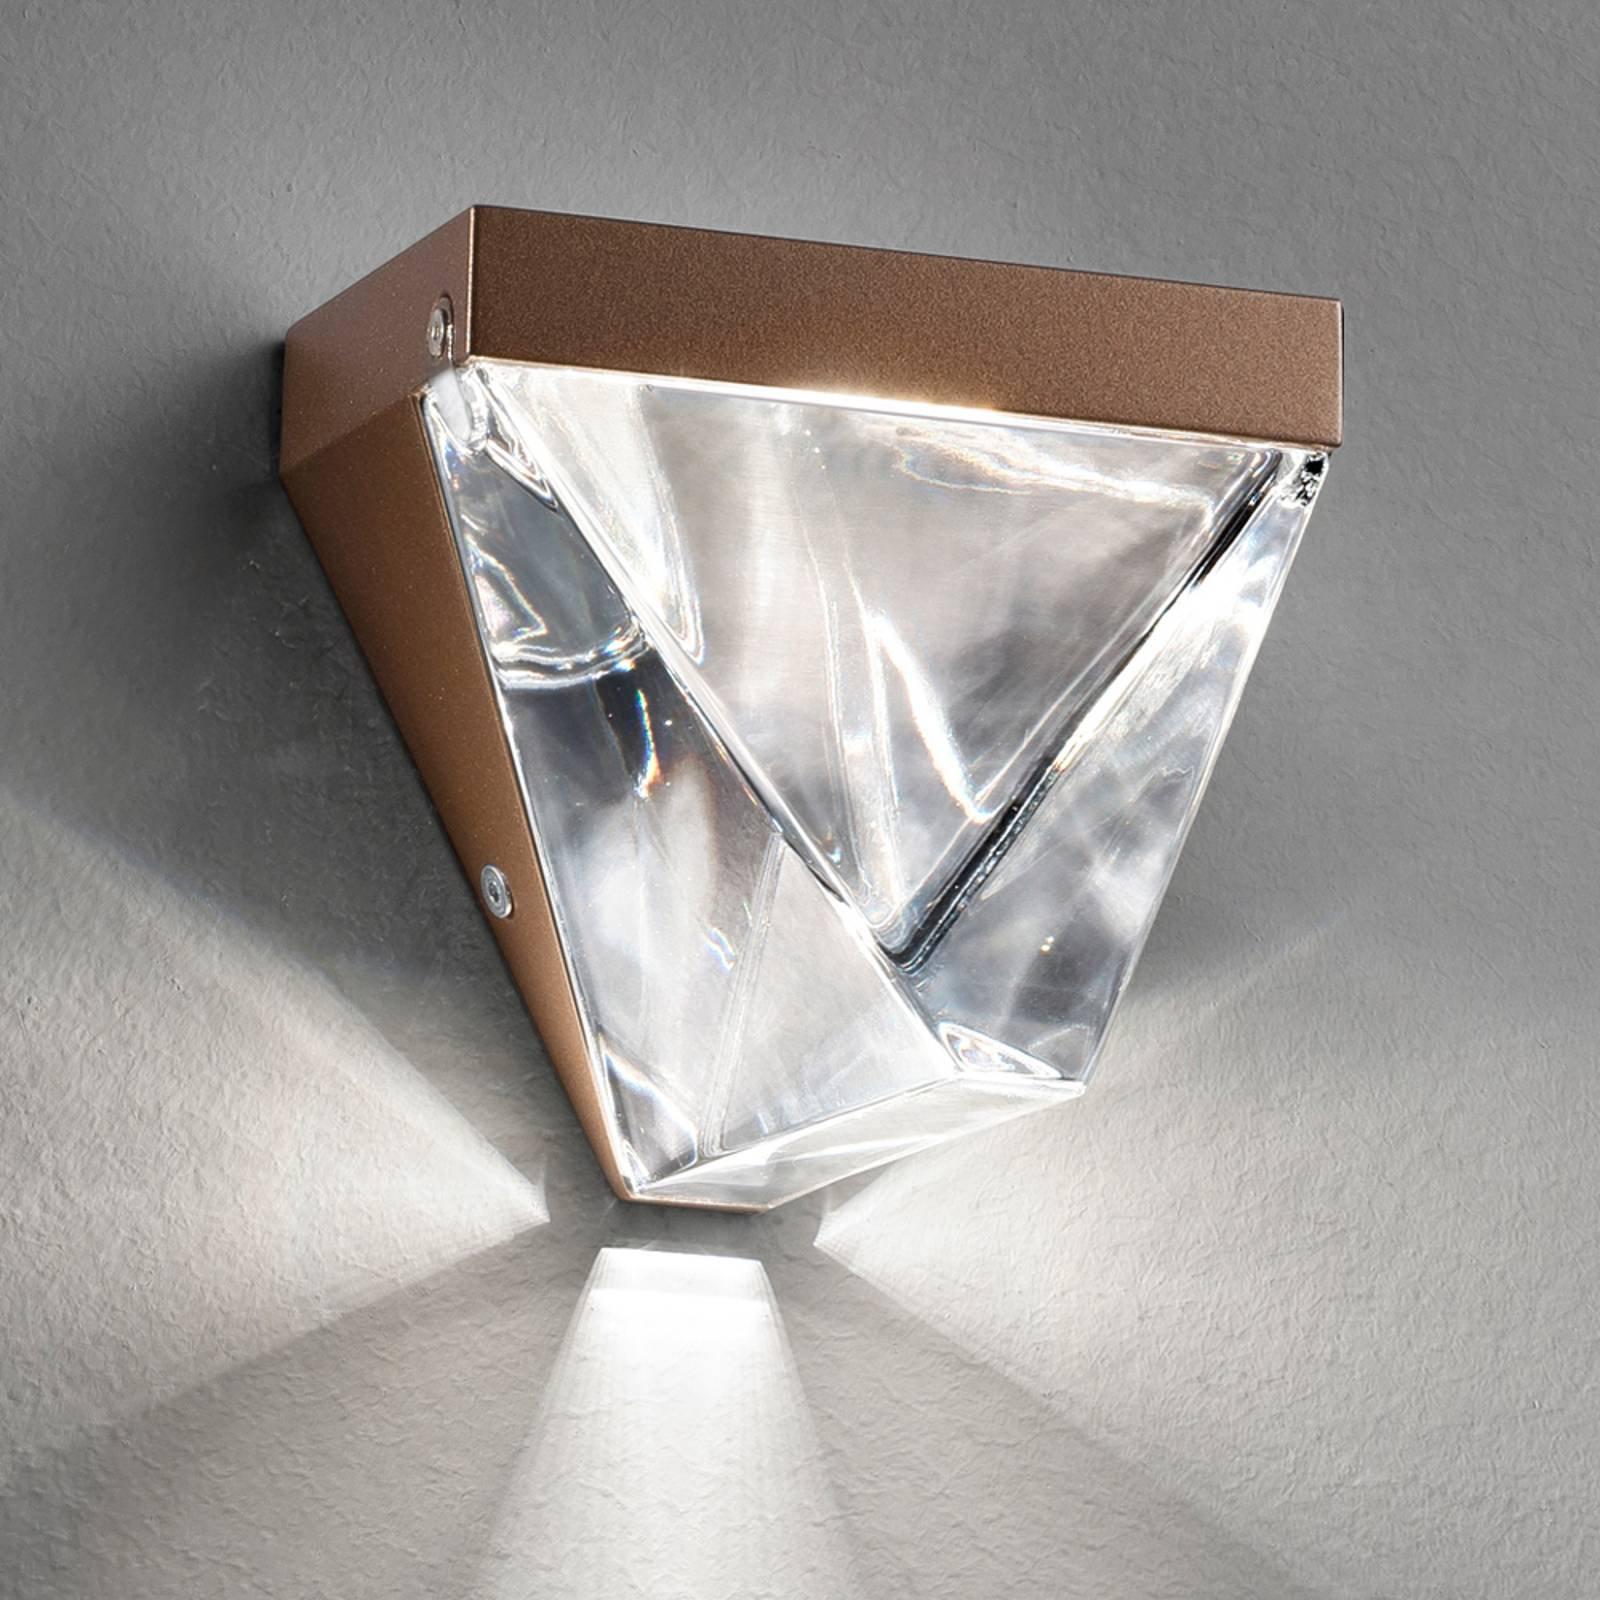 Fabbian Tripla - krystall-LED-vegglampe, bronse